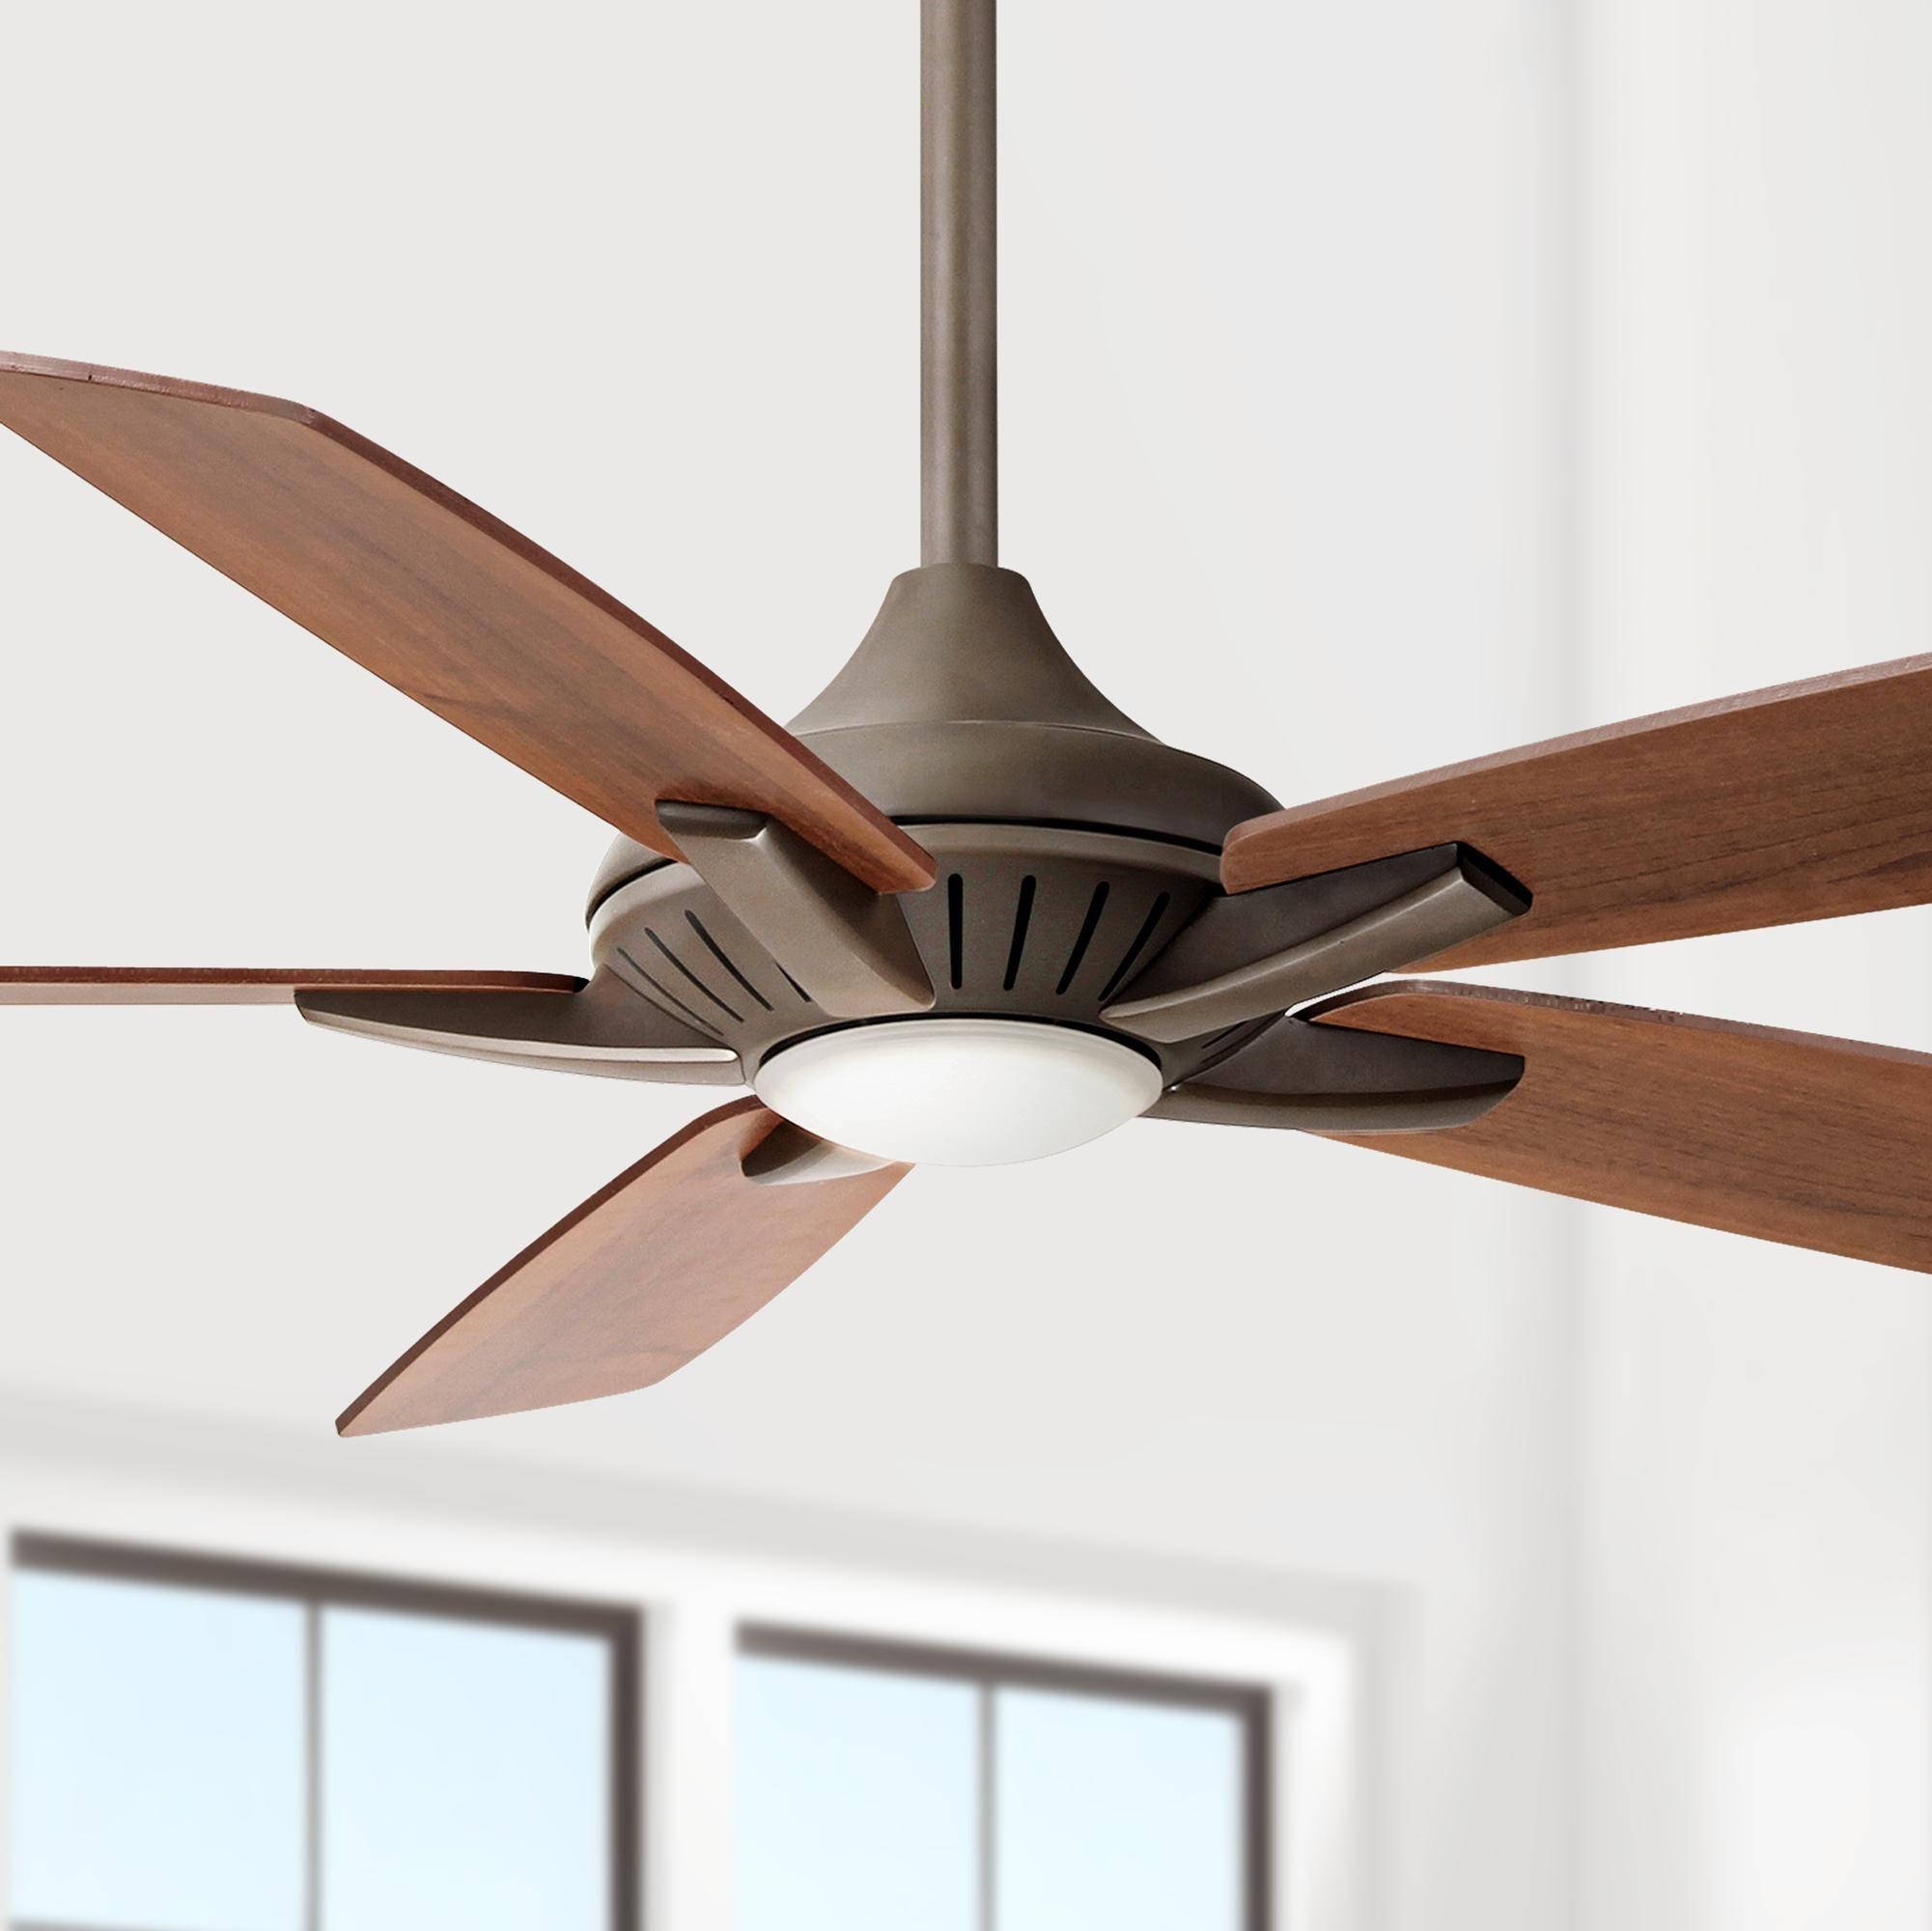 52 Inch Minka Aire Dyno Oil Rubbed Bronze Ceiling Fan